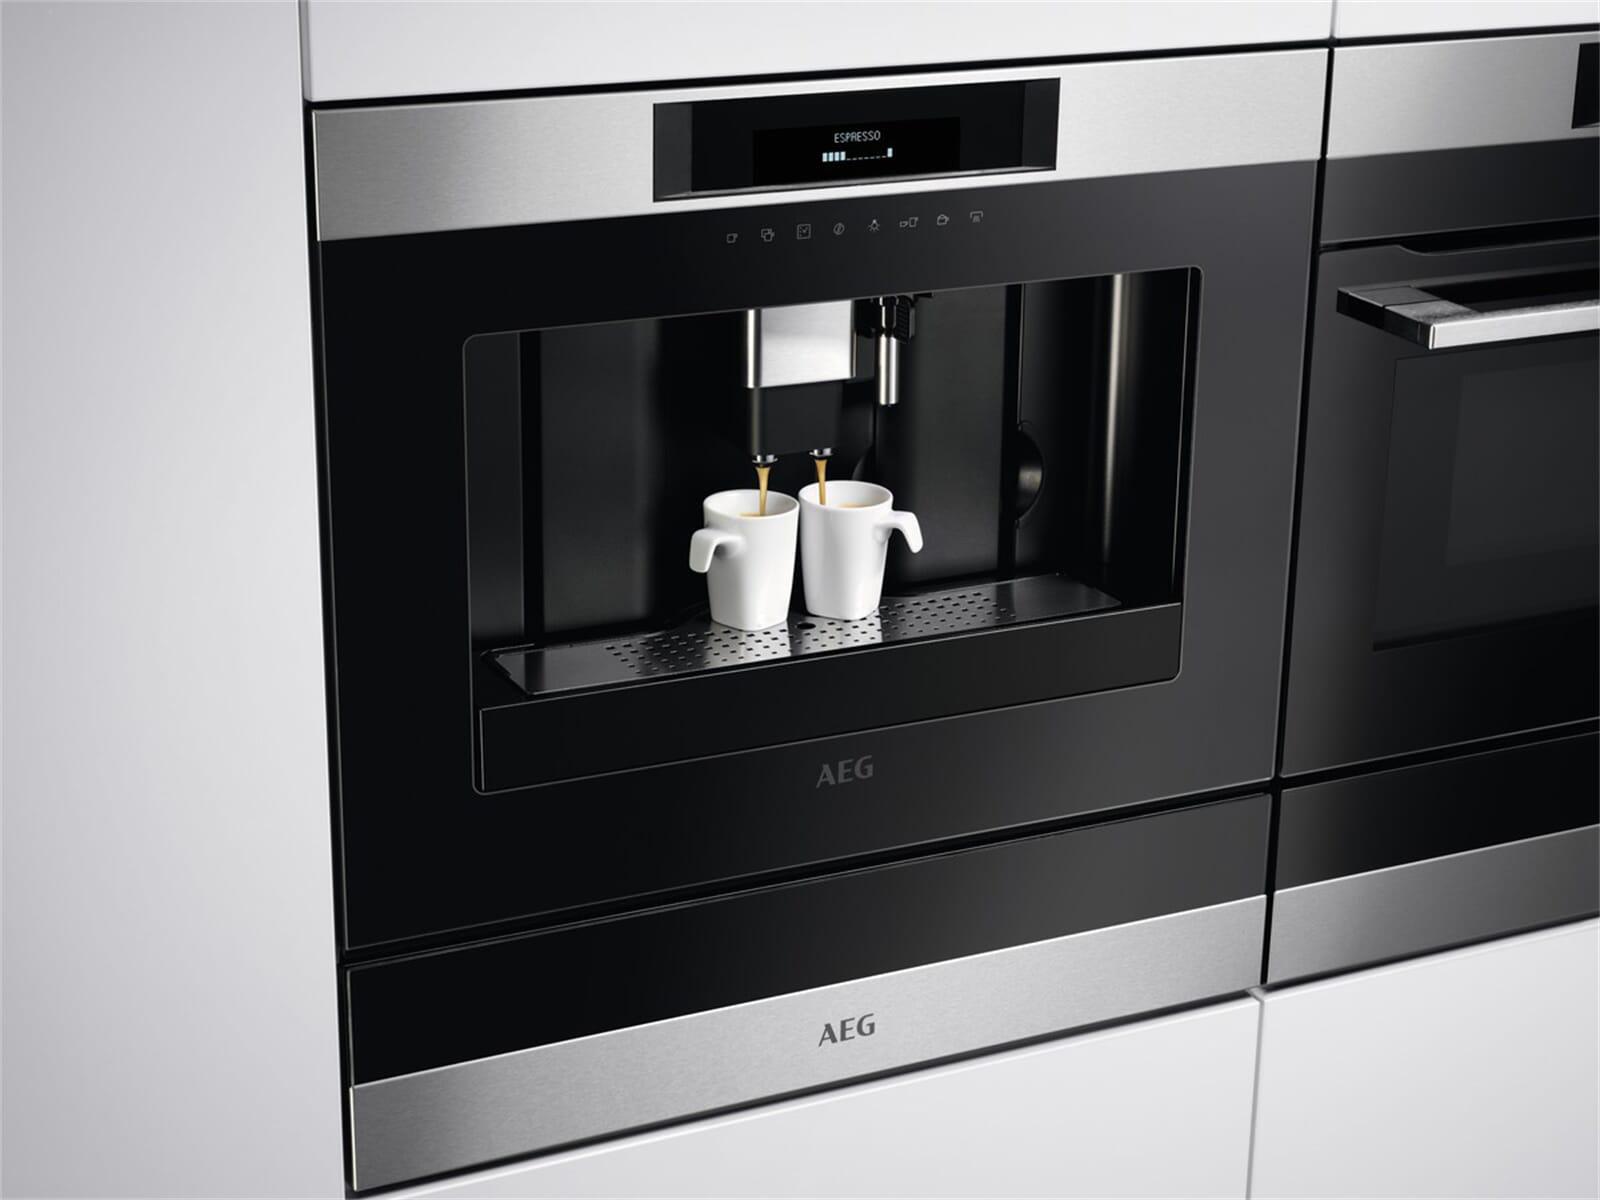 AEG KKK M Einbau Espresso Kaffeevollautomat Edelstahl